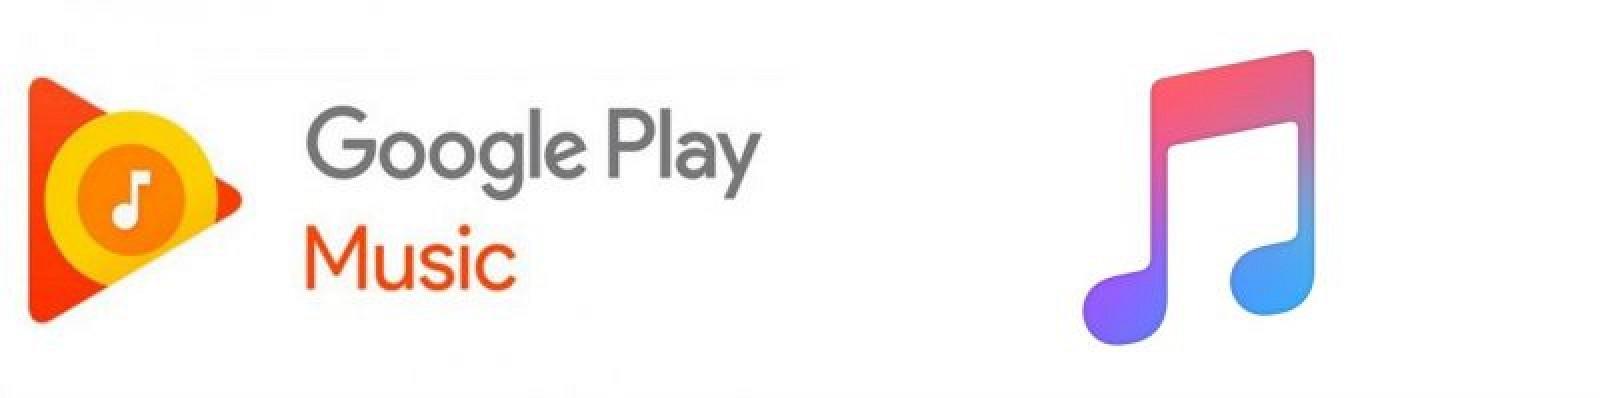 Google Play Music Mac